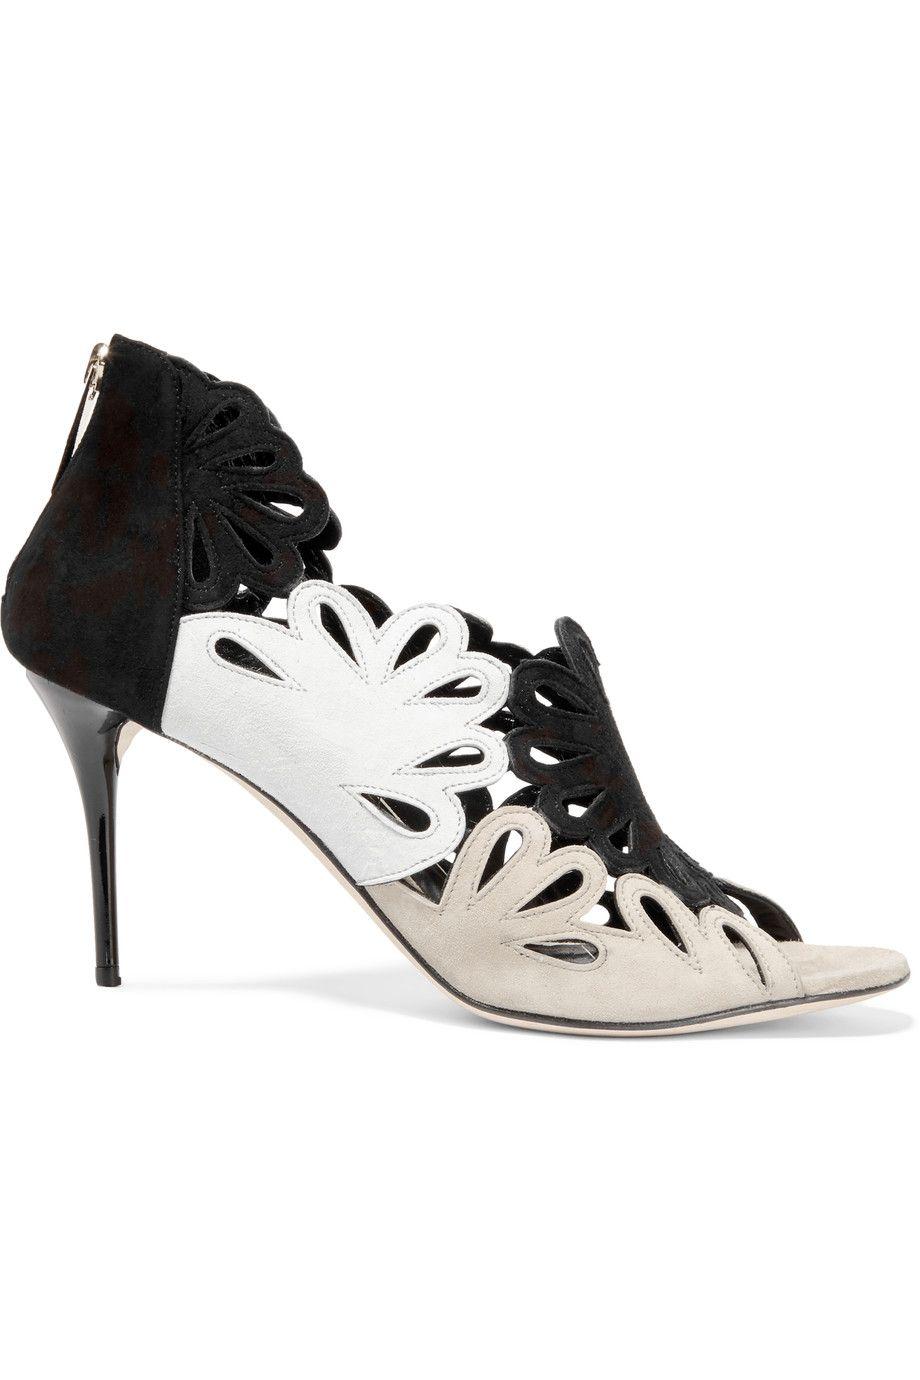 OSCAR DE LA RENTA Jazzi laser-cut suede sandals. #oscardelarenta #shoes #sandals